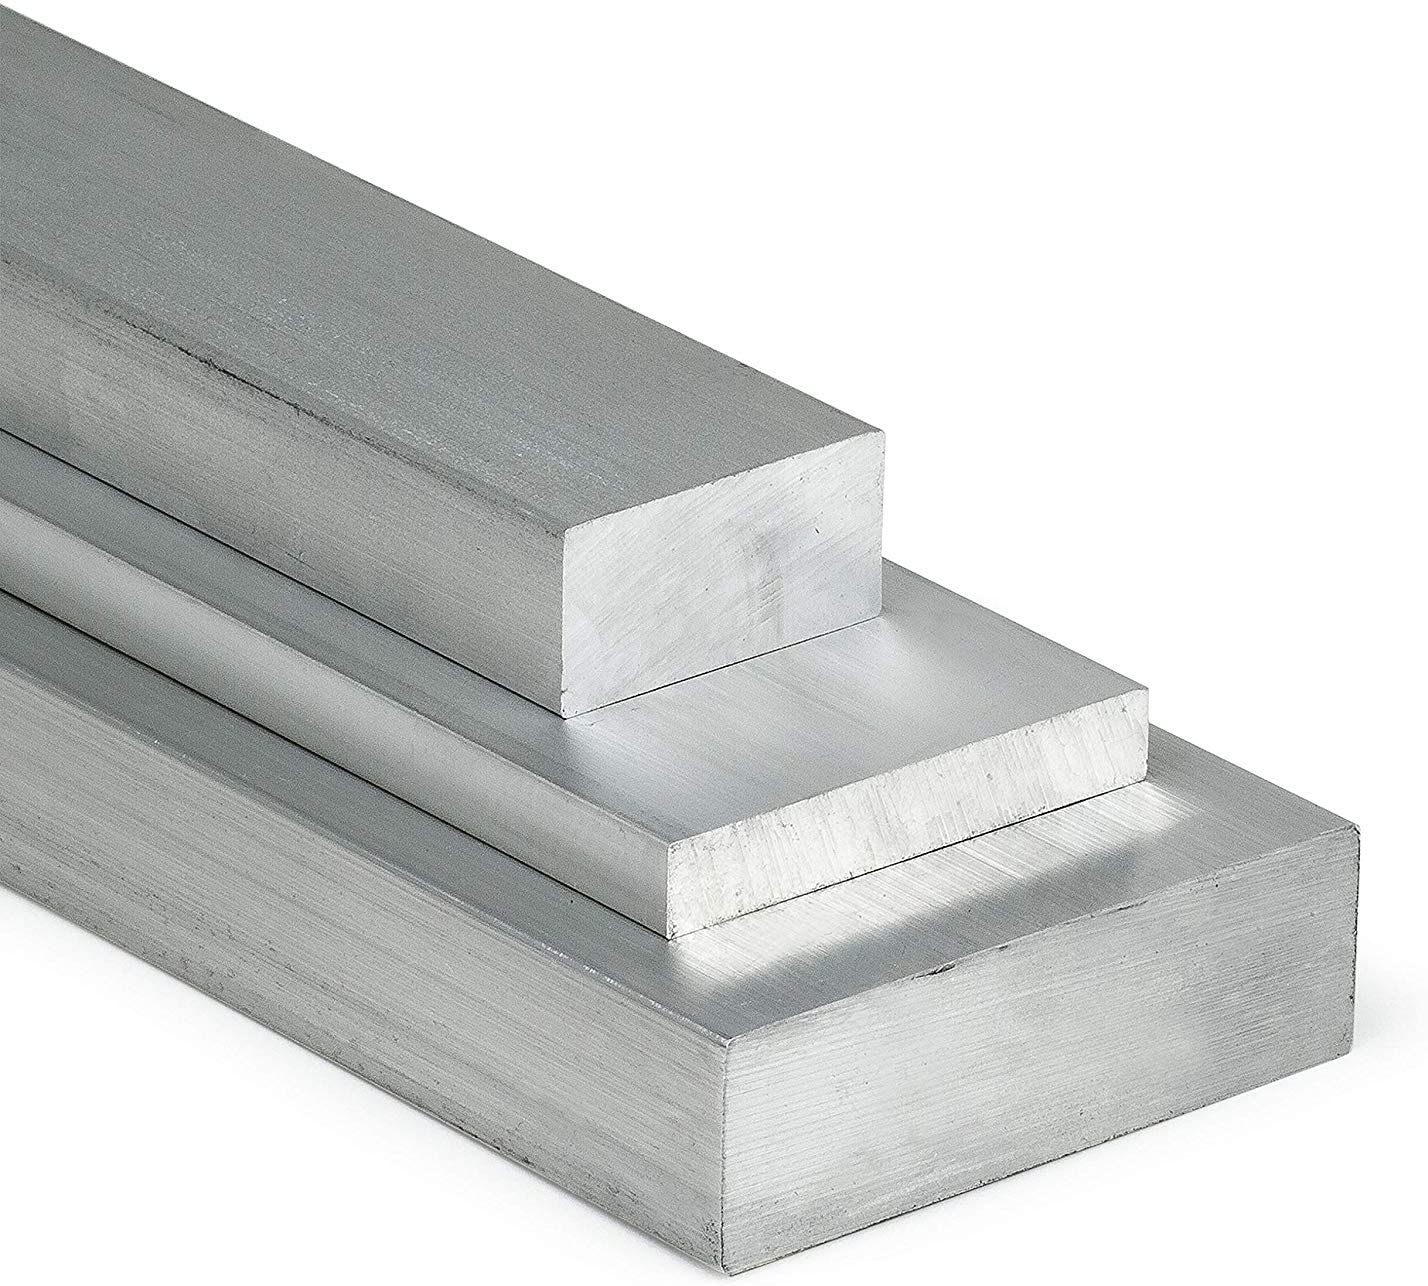 3.3206 Flat Bar Aluminium Profile 15 x 10 mm 100 x 15 mm Flat Material AlMgSi0.5 Flat Iron